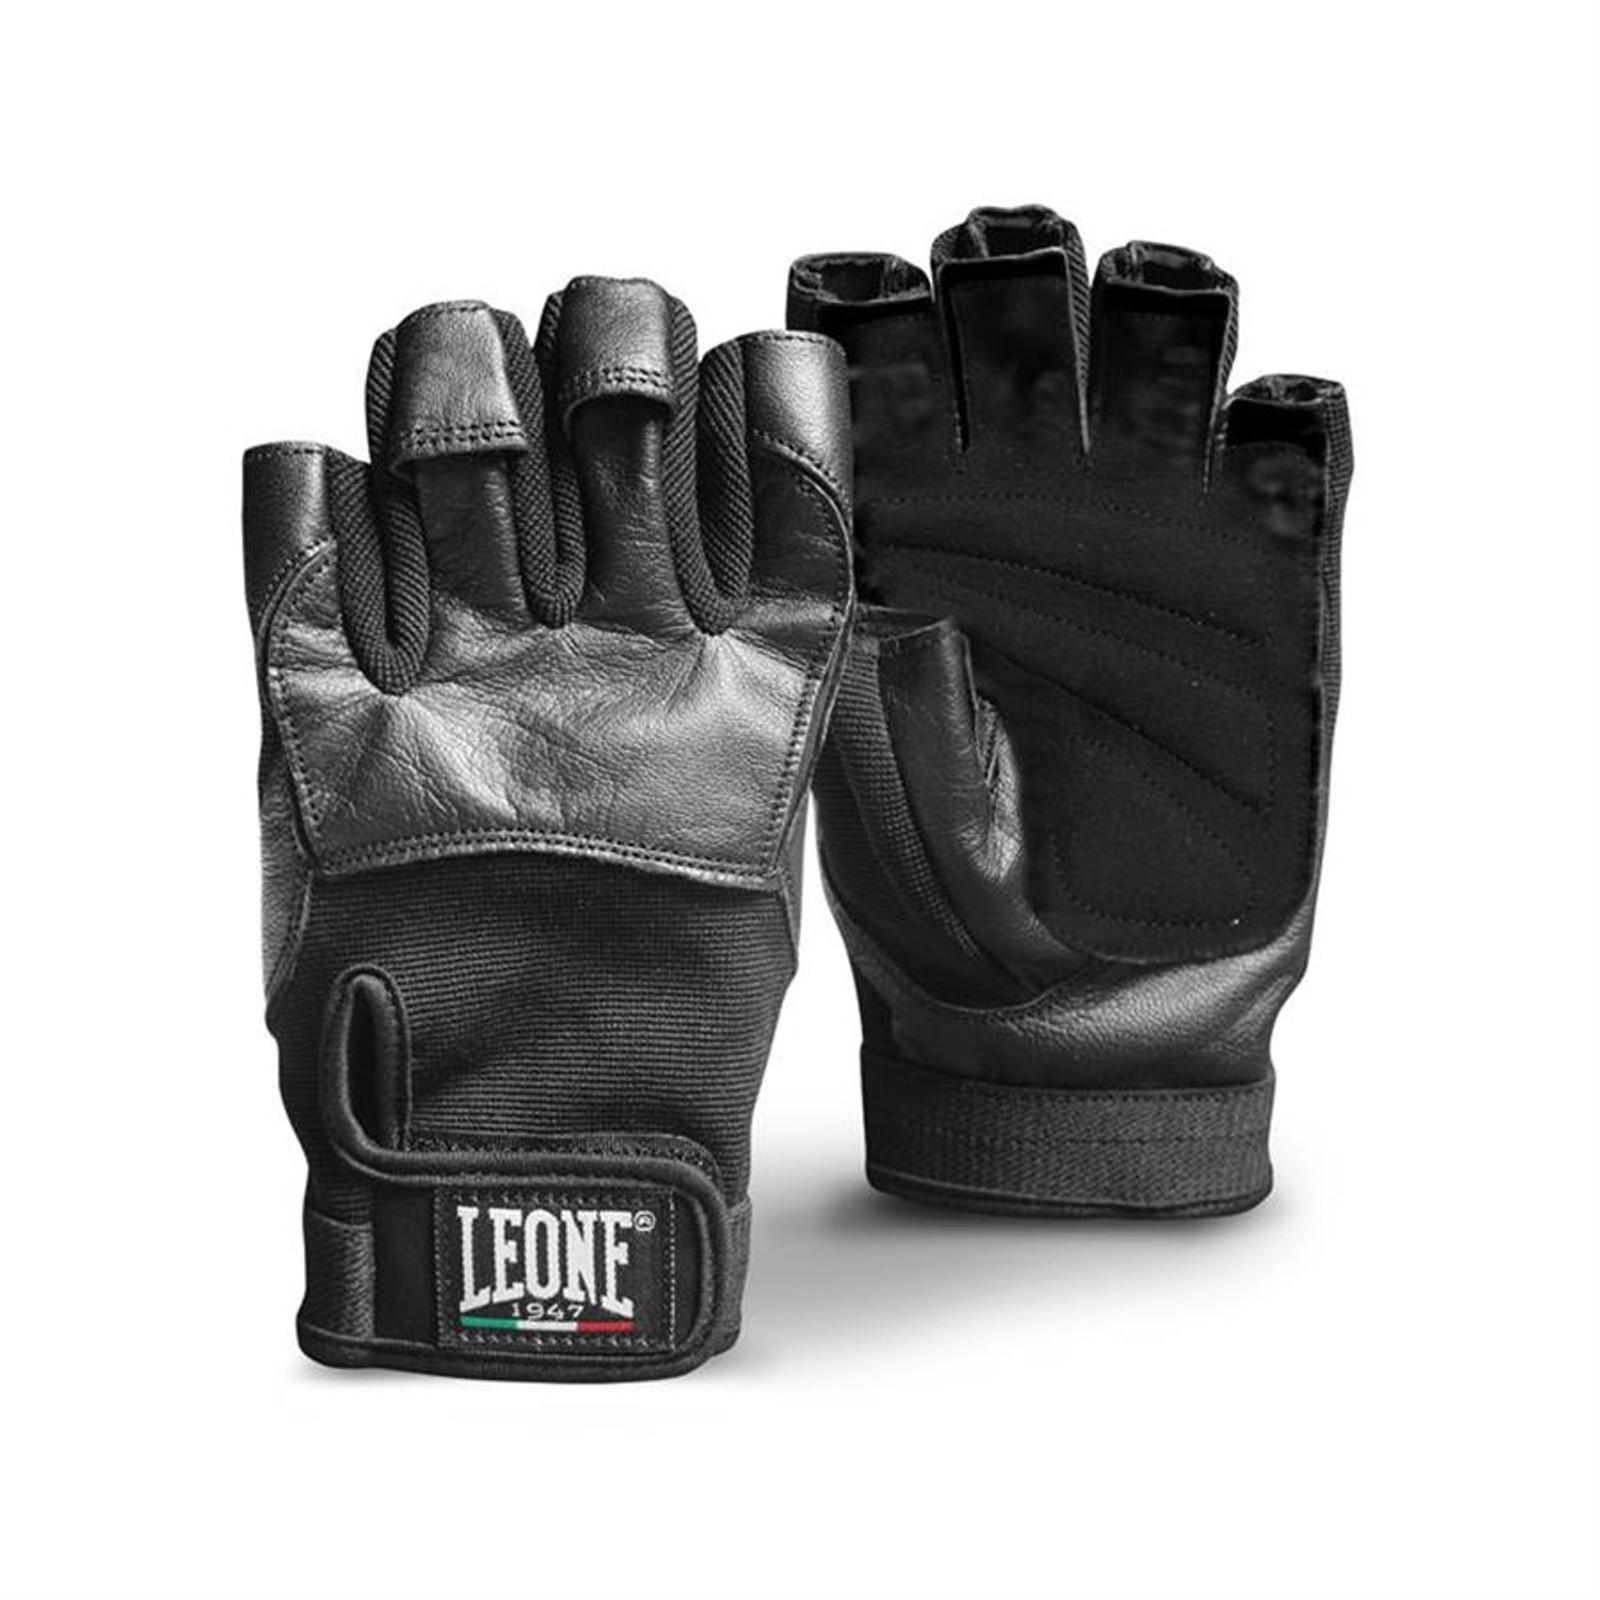 Leone 1947 Fitness Handschuhe AB713